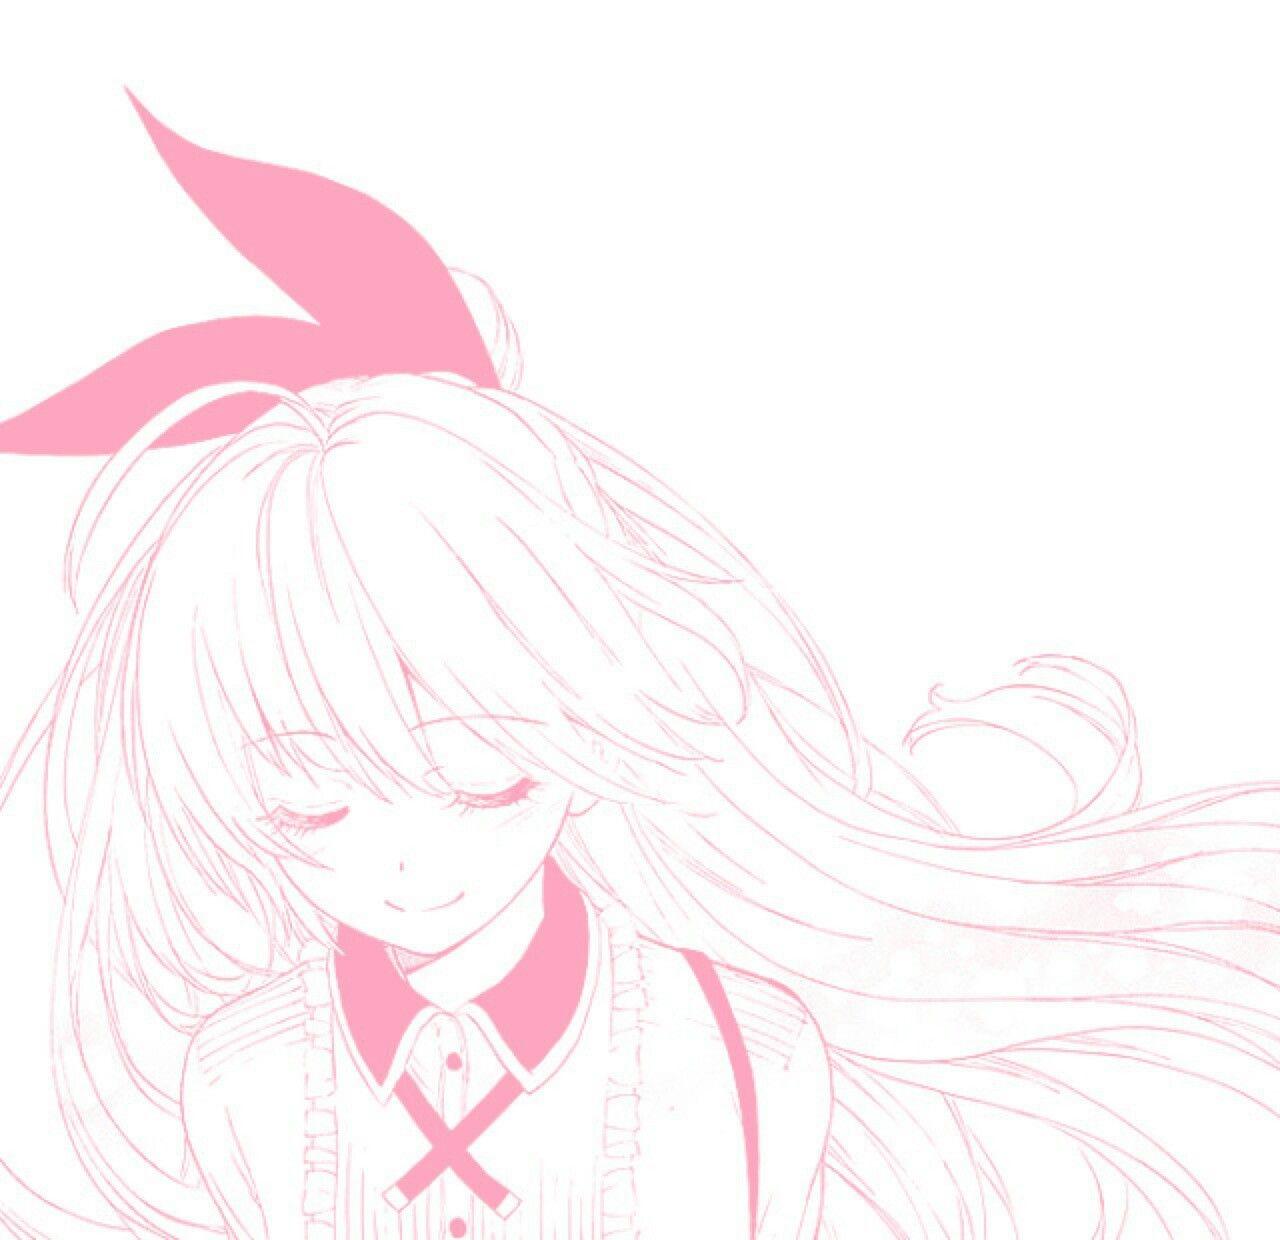 ᴵᶰᵍᵉᶰᵘᵉ ᵍᶤʳˡ Aesthetic Anime Anime Kawaii Anime